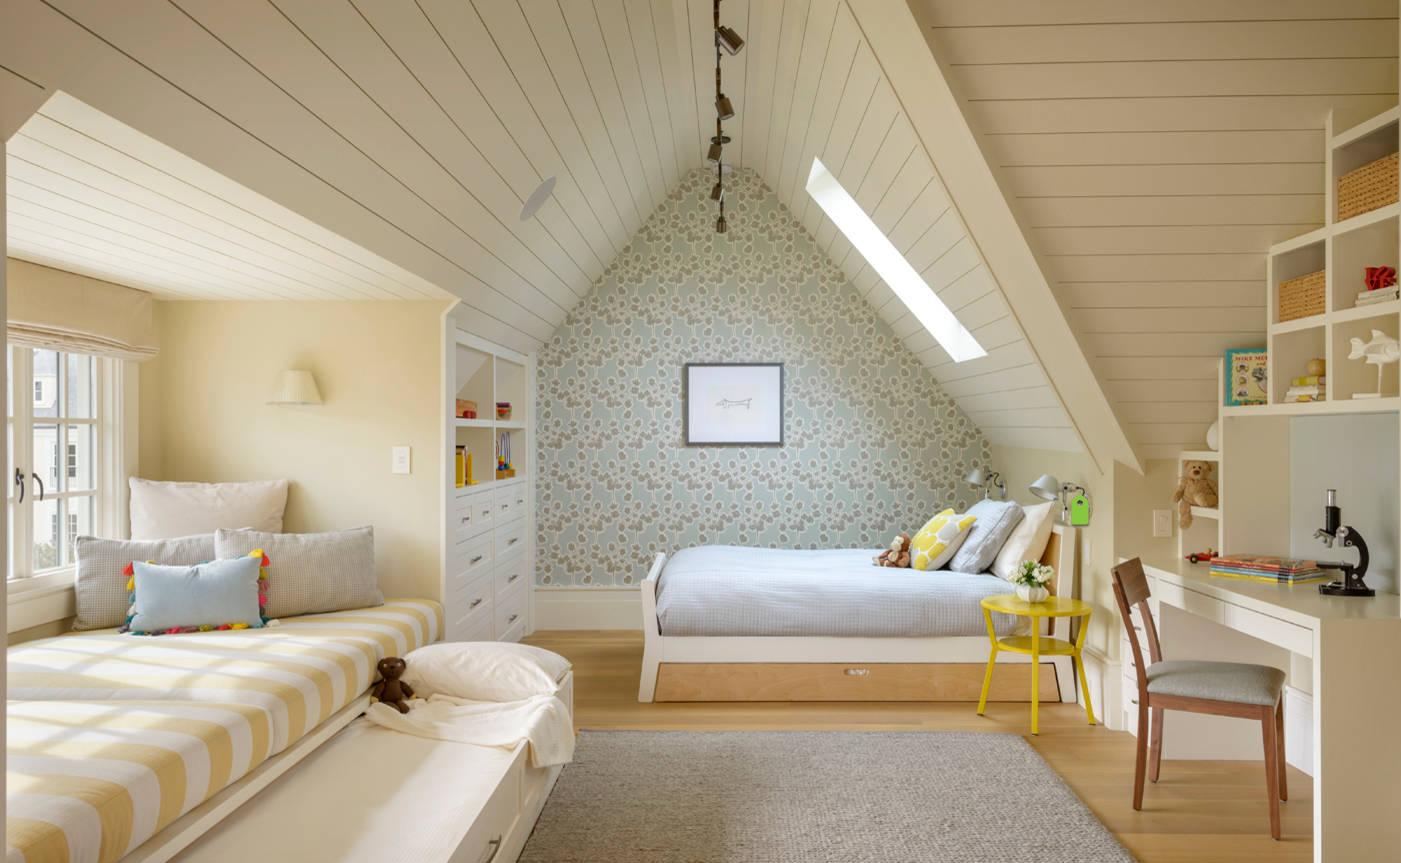 Arredare mansarda camera da letto free camera da letto with arredare mansarda camera da letto - Camera da letto in mansarda ...